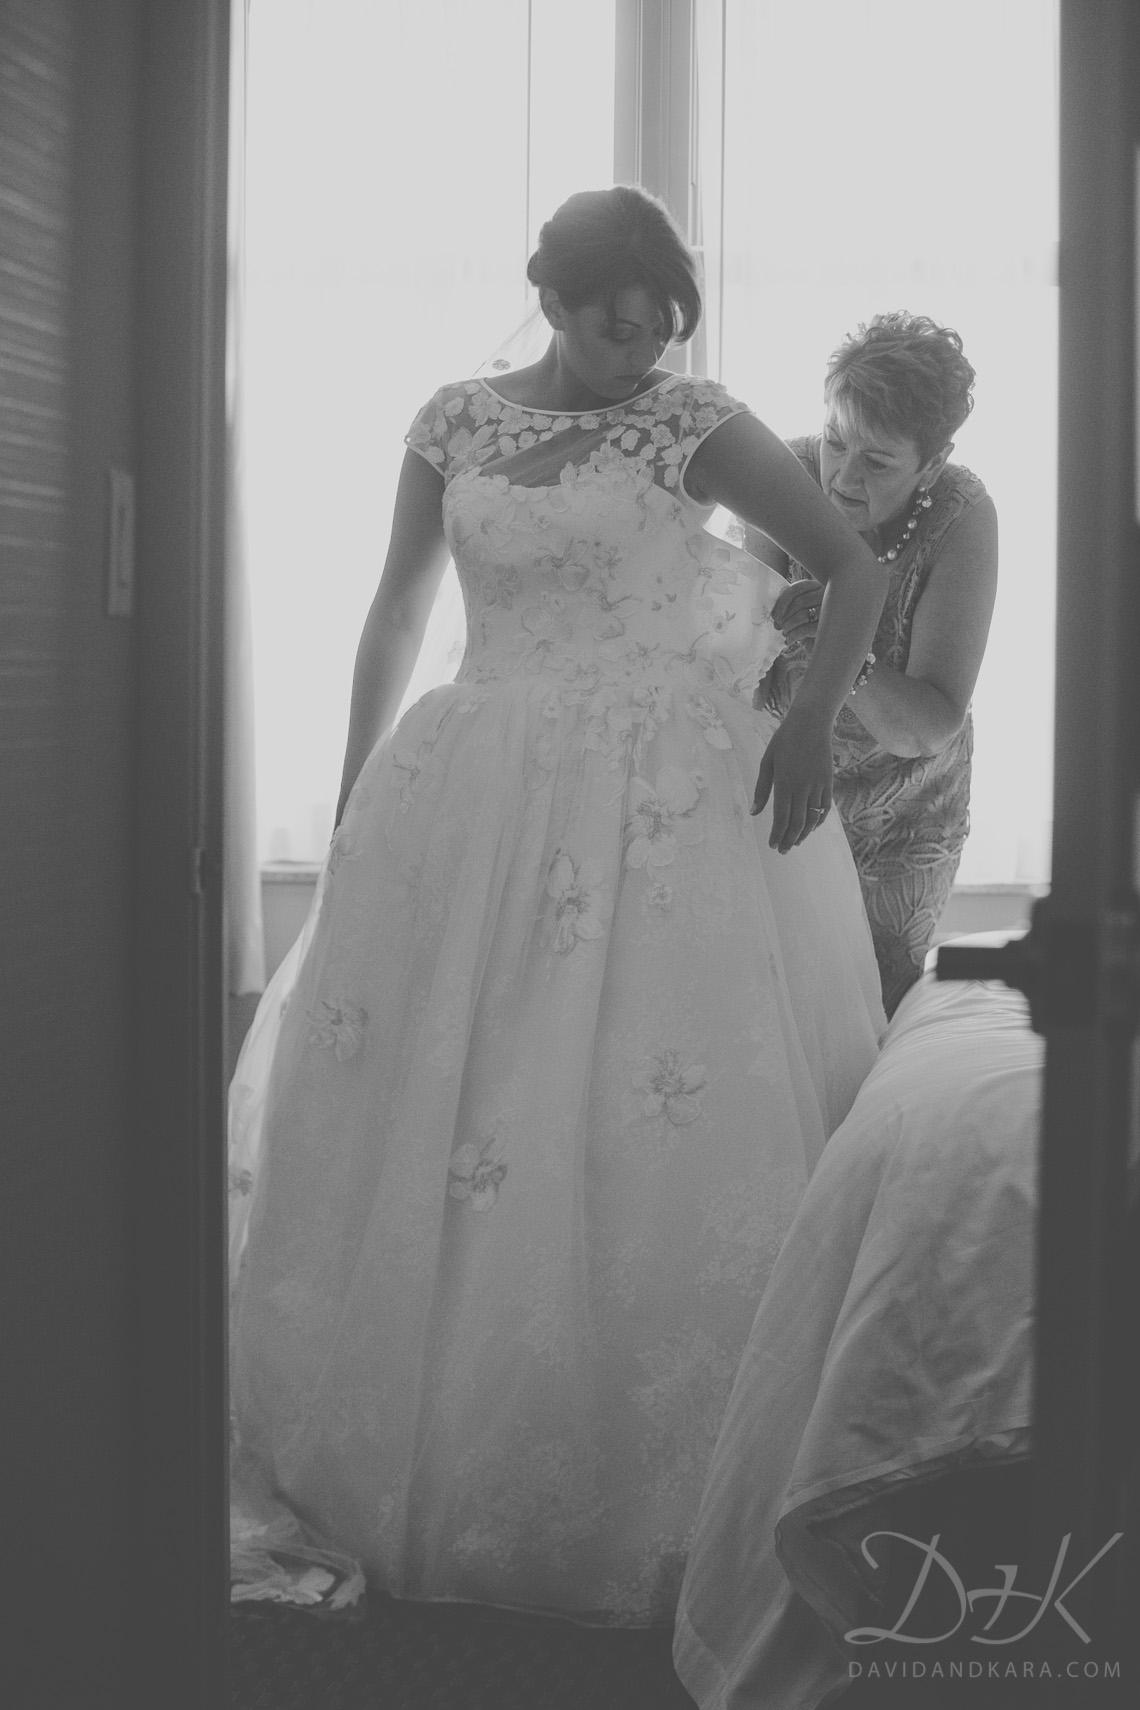 Guelph Wedding Photographers David + Kara Wedding Imagery